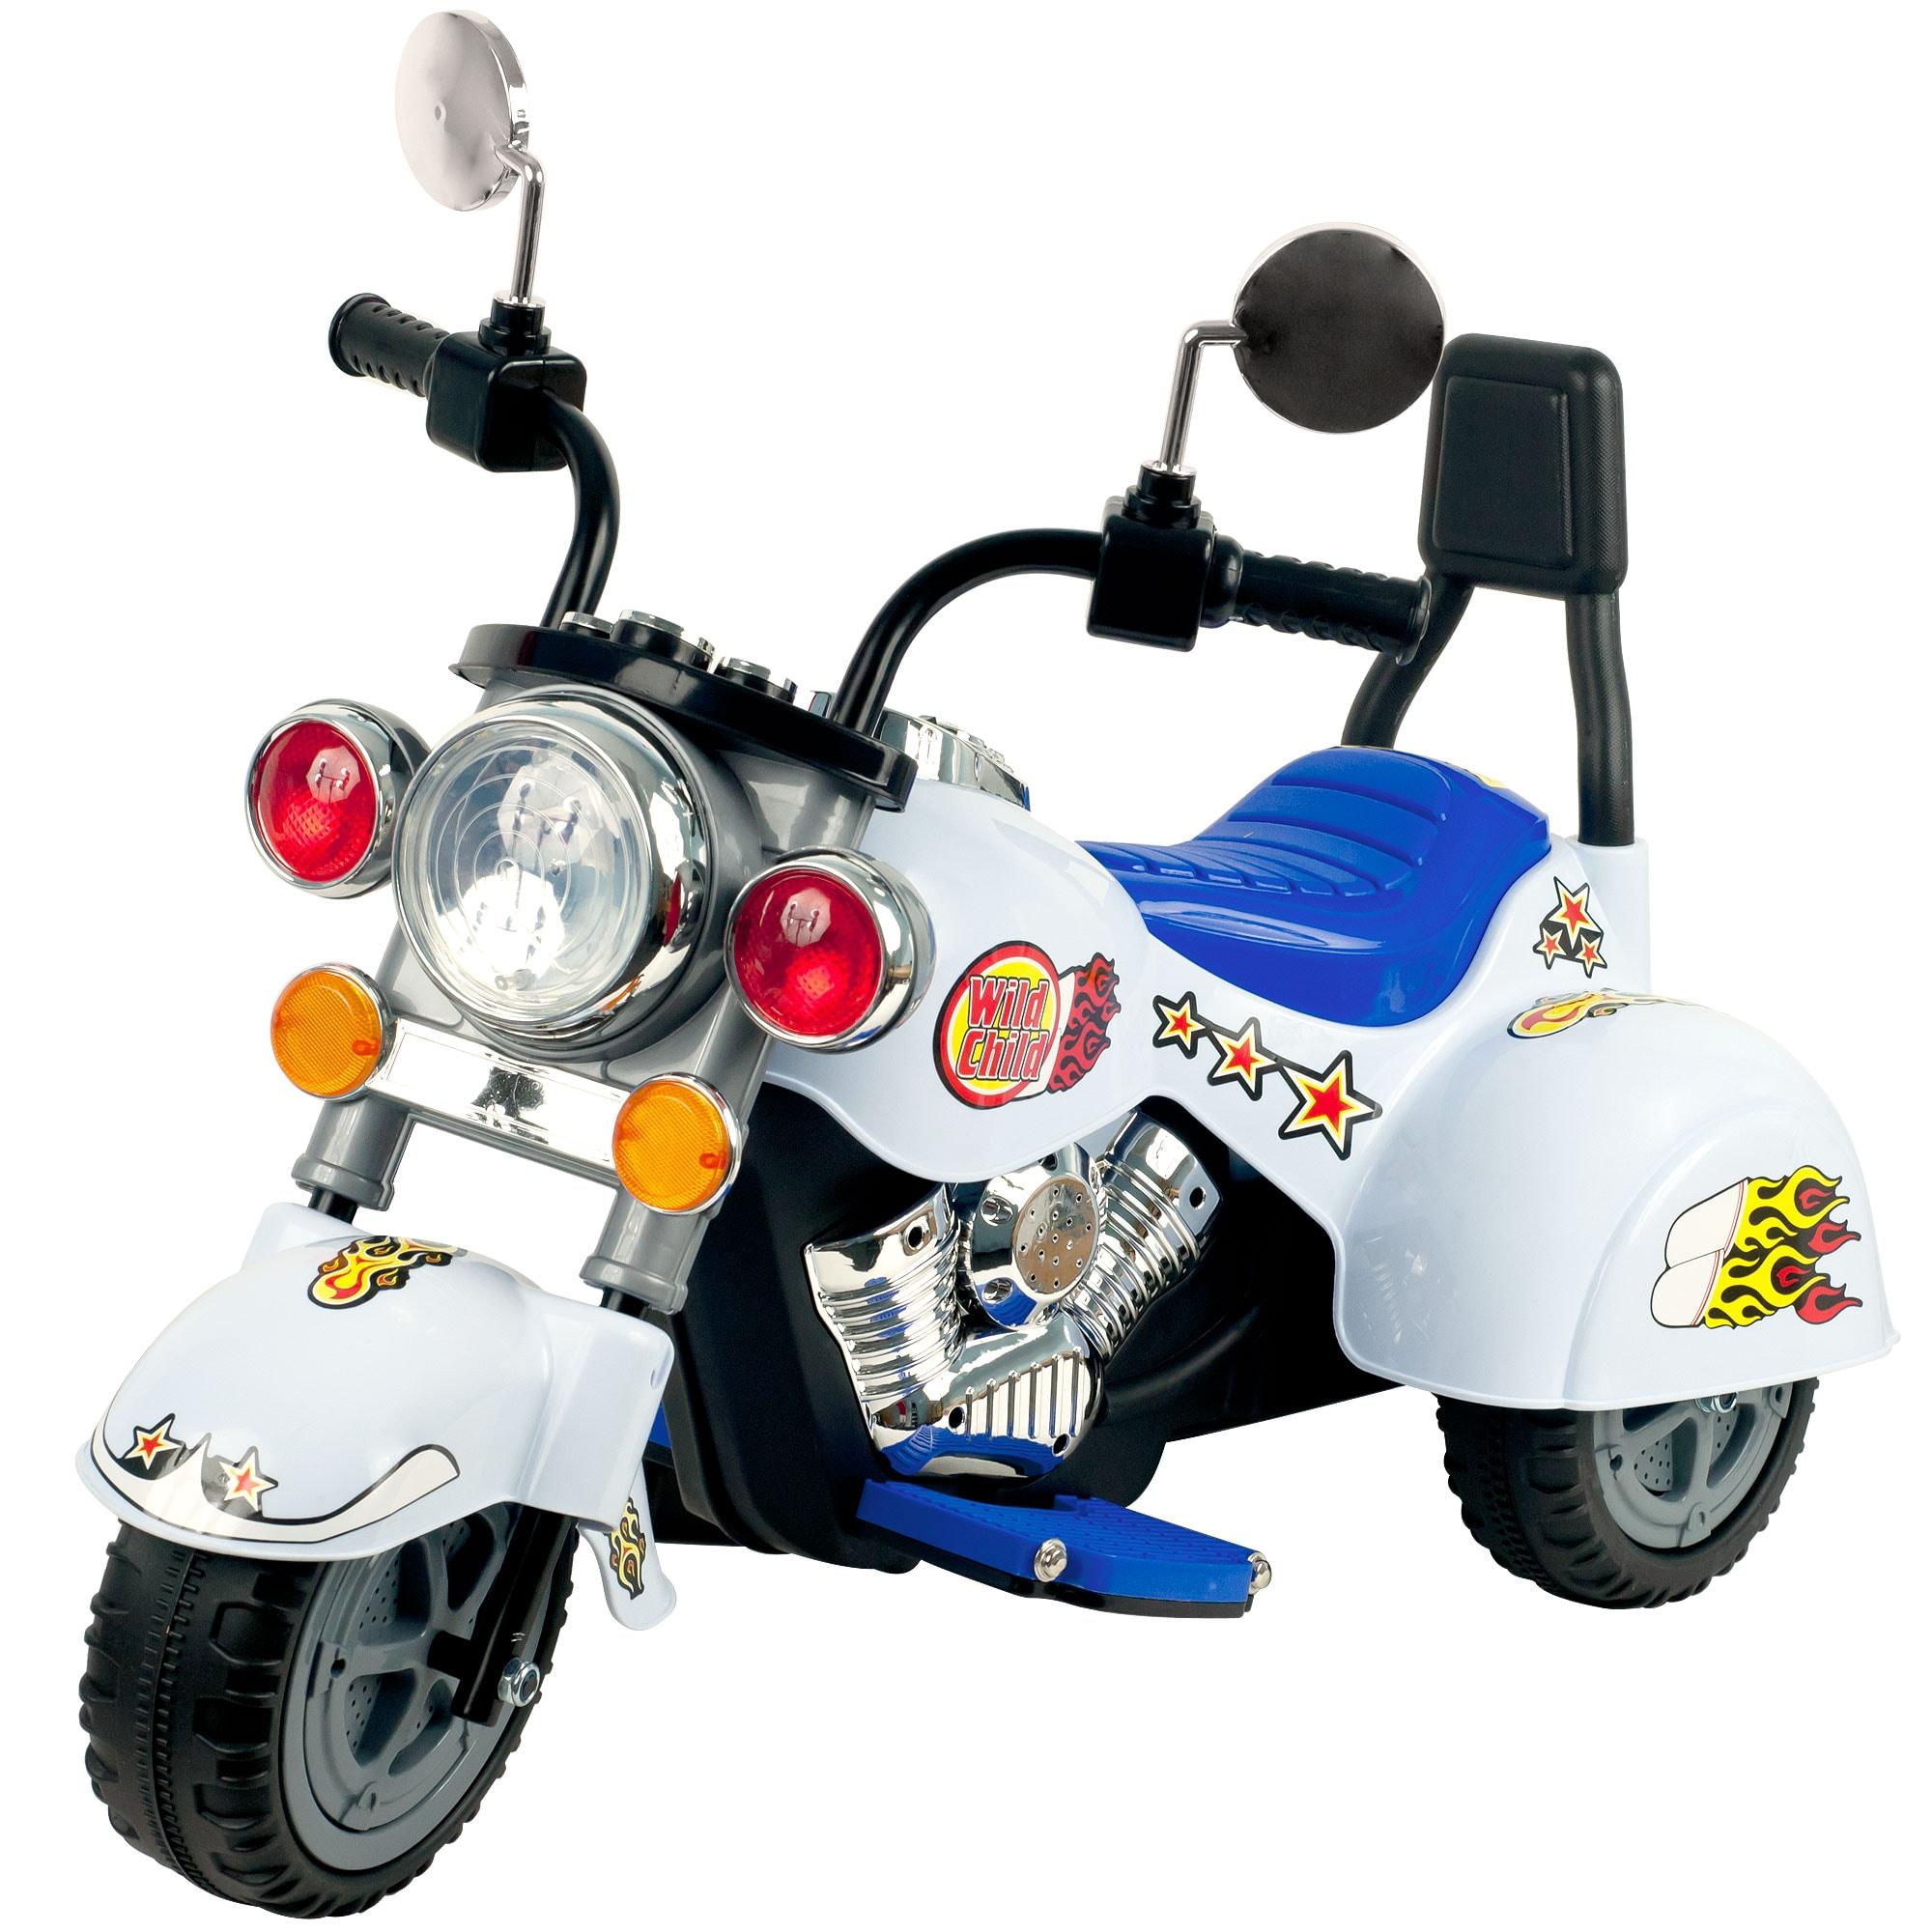 Shop 3 Wheel Chopper Motorcycle, Ride on Toy for Kids by Rockin ...